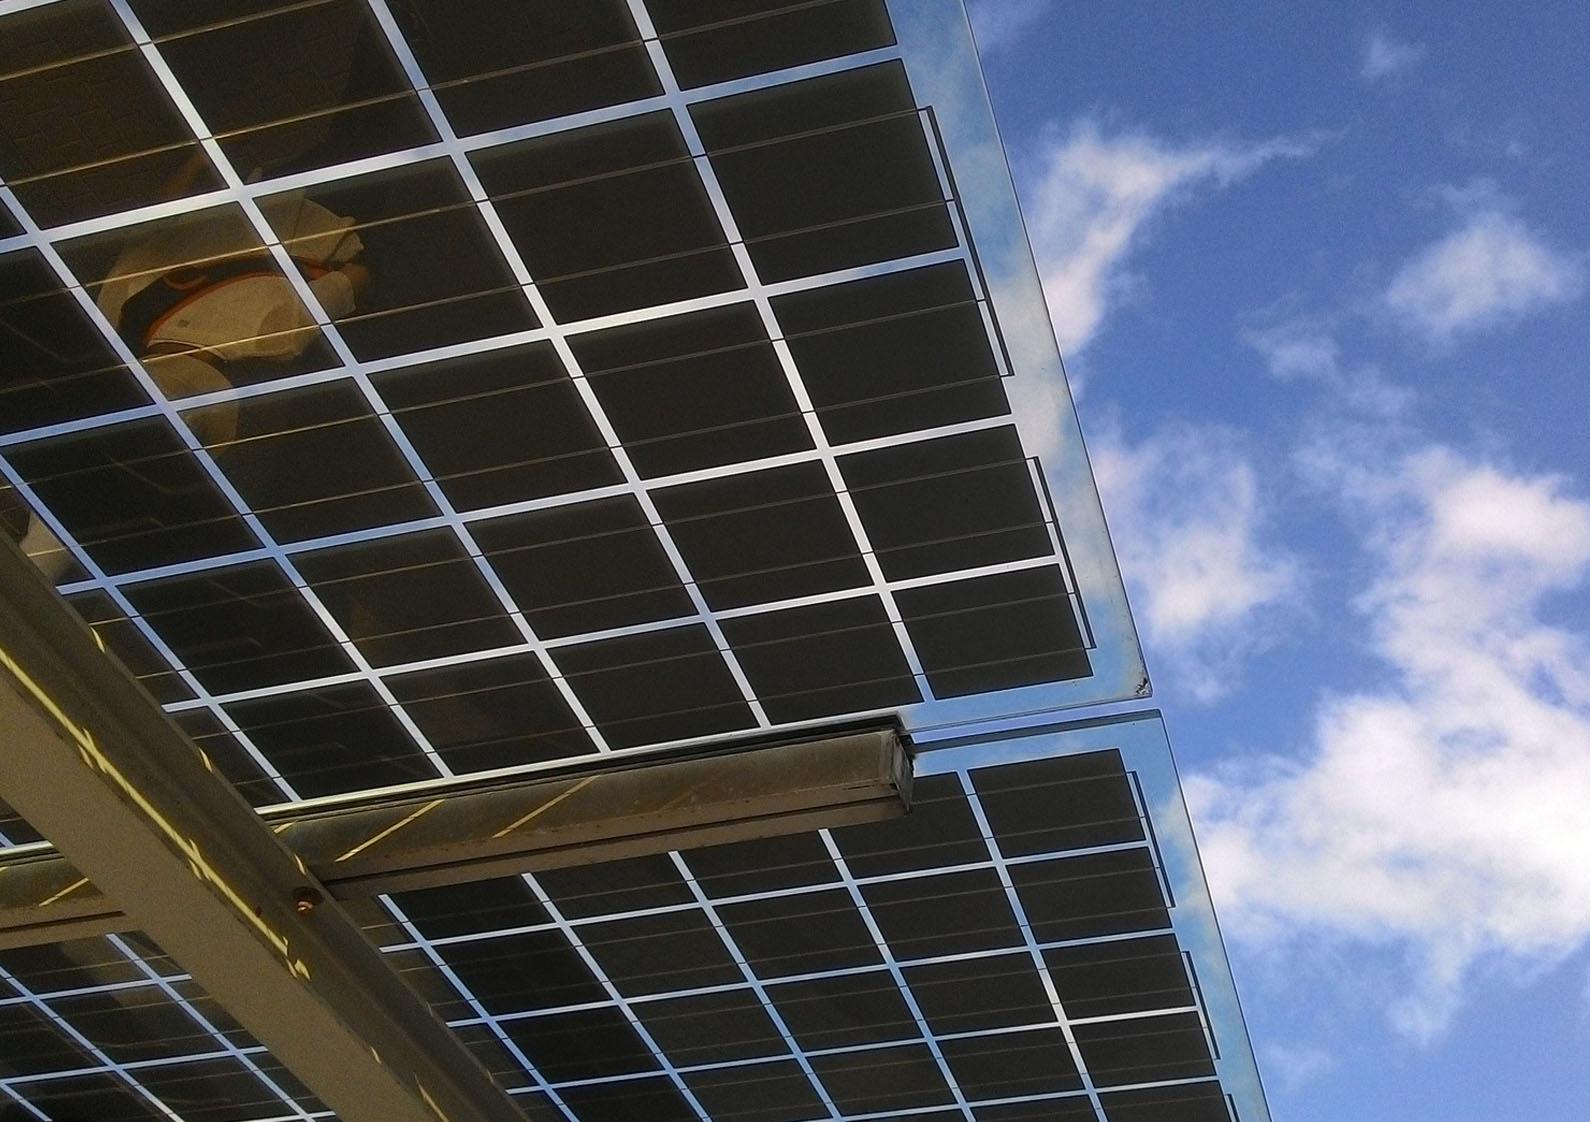 detalle placa solar